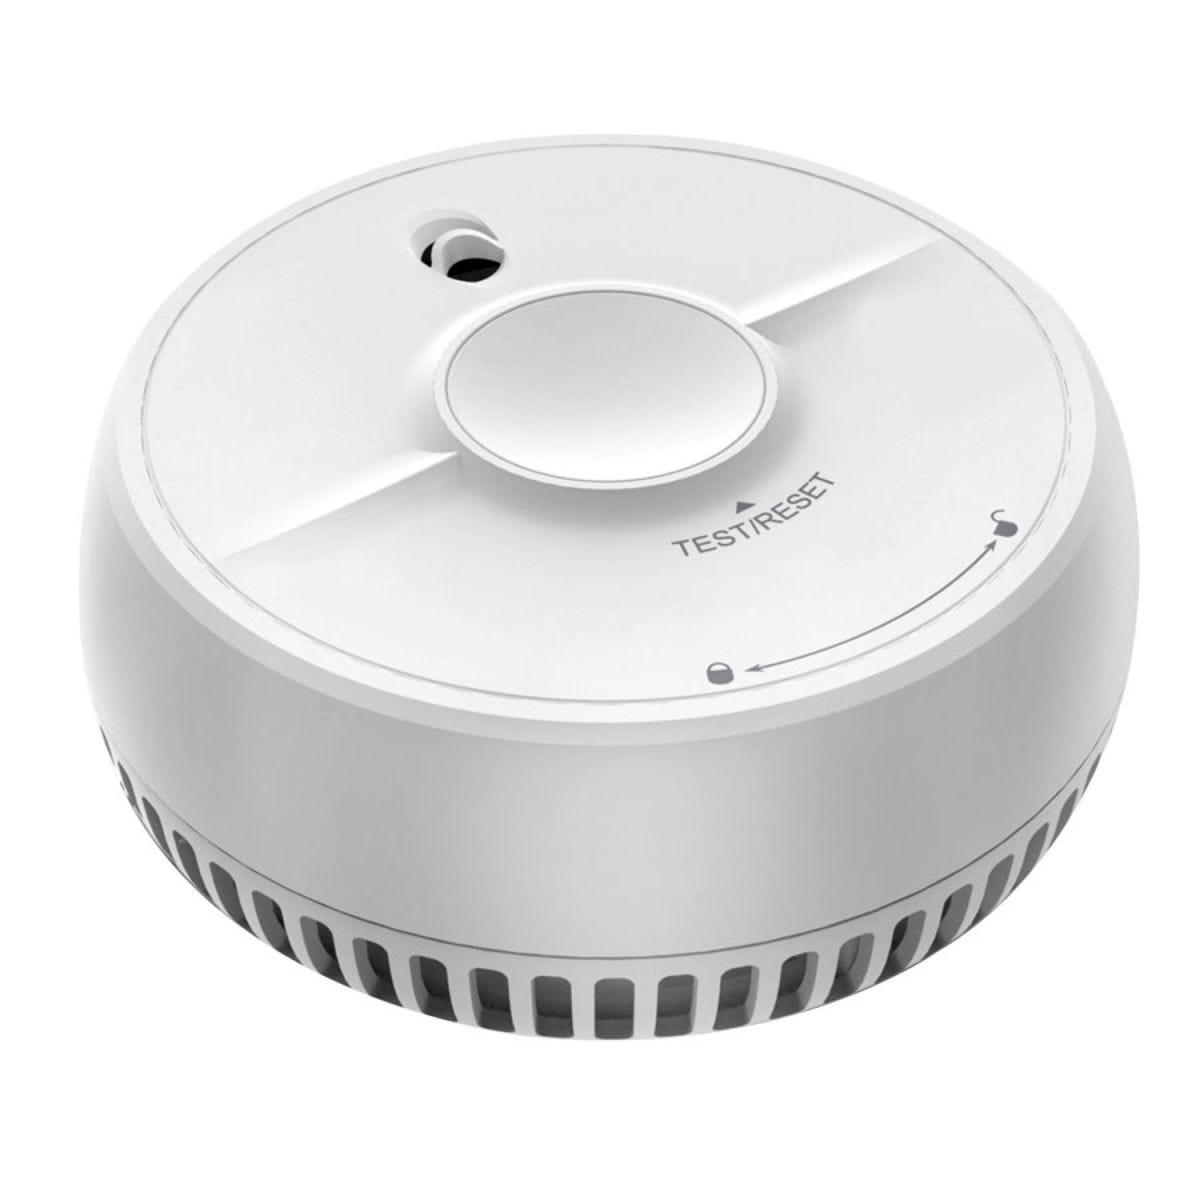 FireAngel SB1-R Toast Proof Smoke Alarm with 1 Year Battery